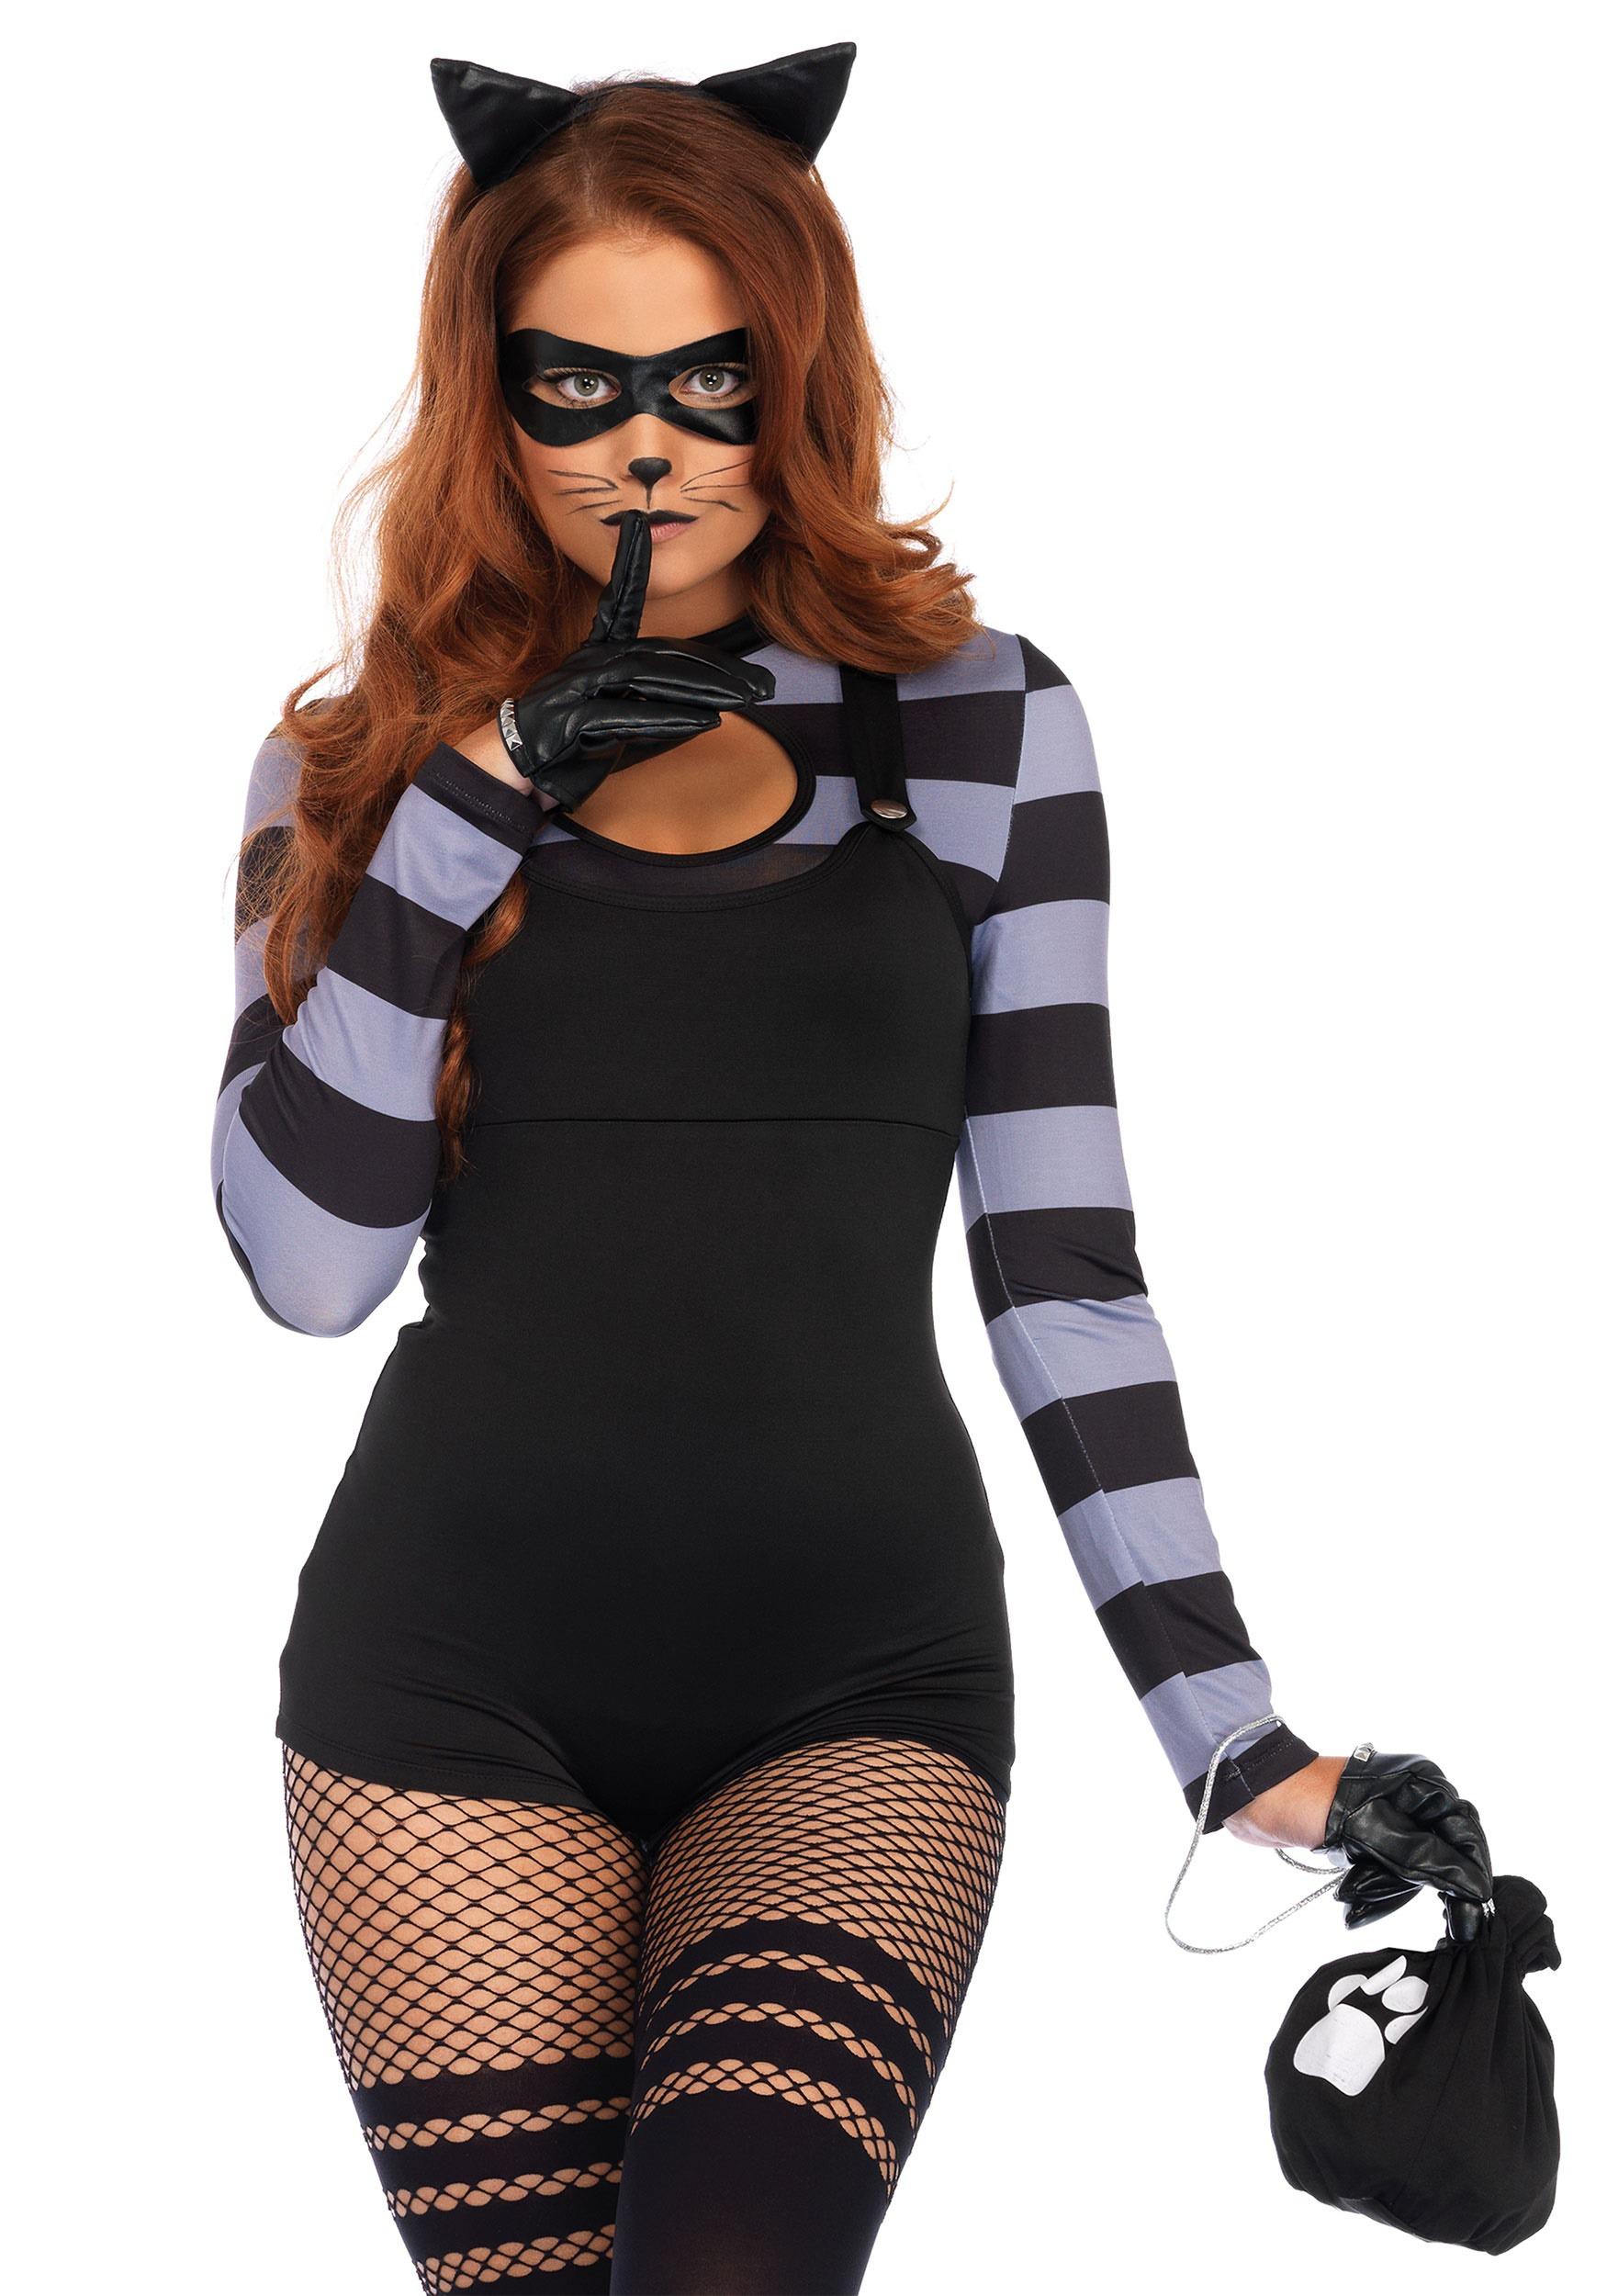 Cat Burglar Womens Costume  sc 1 st  Halloween Costumes & Cat Burglar Costume for Women